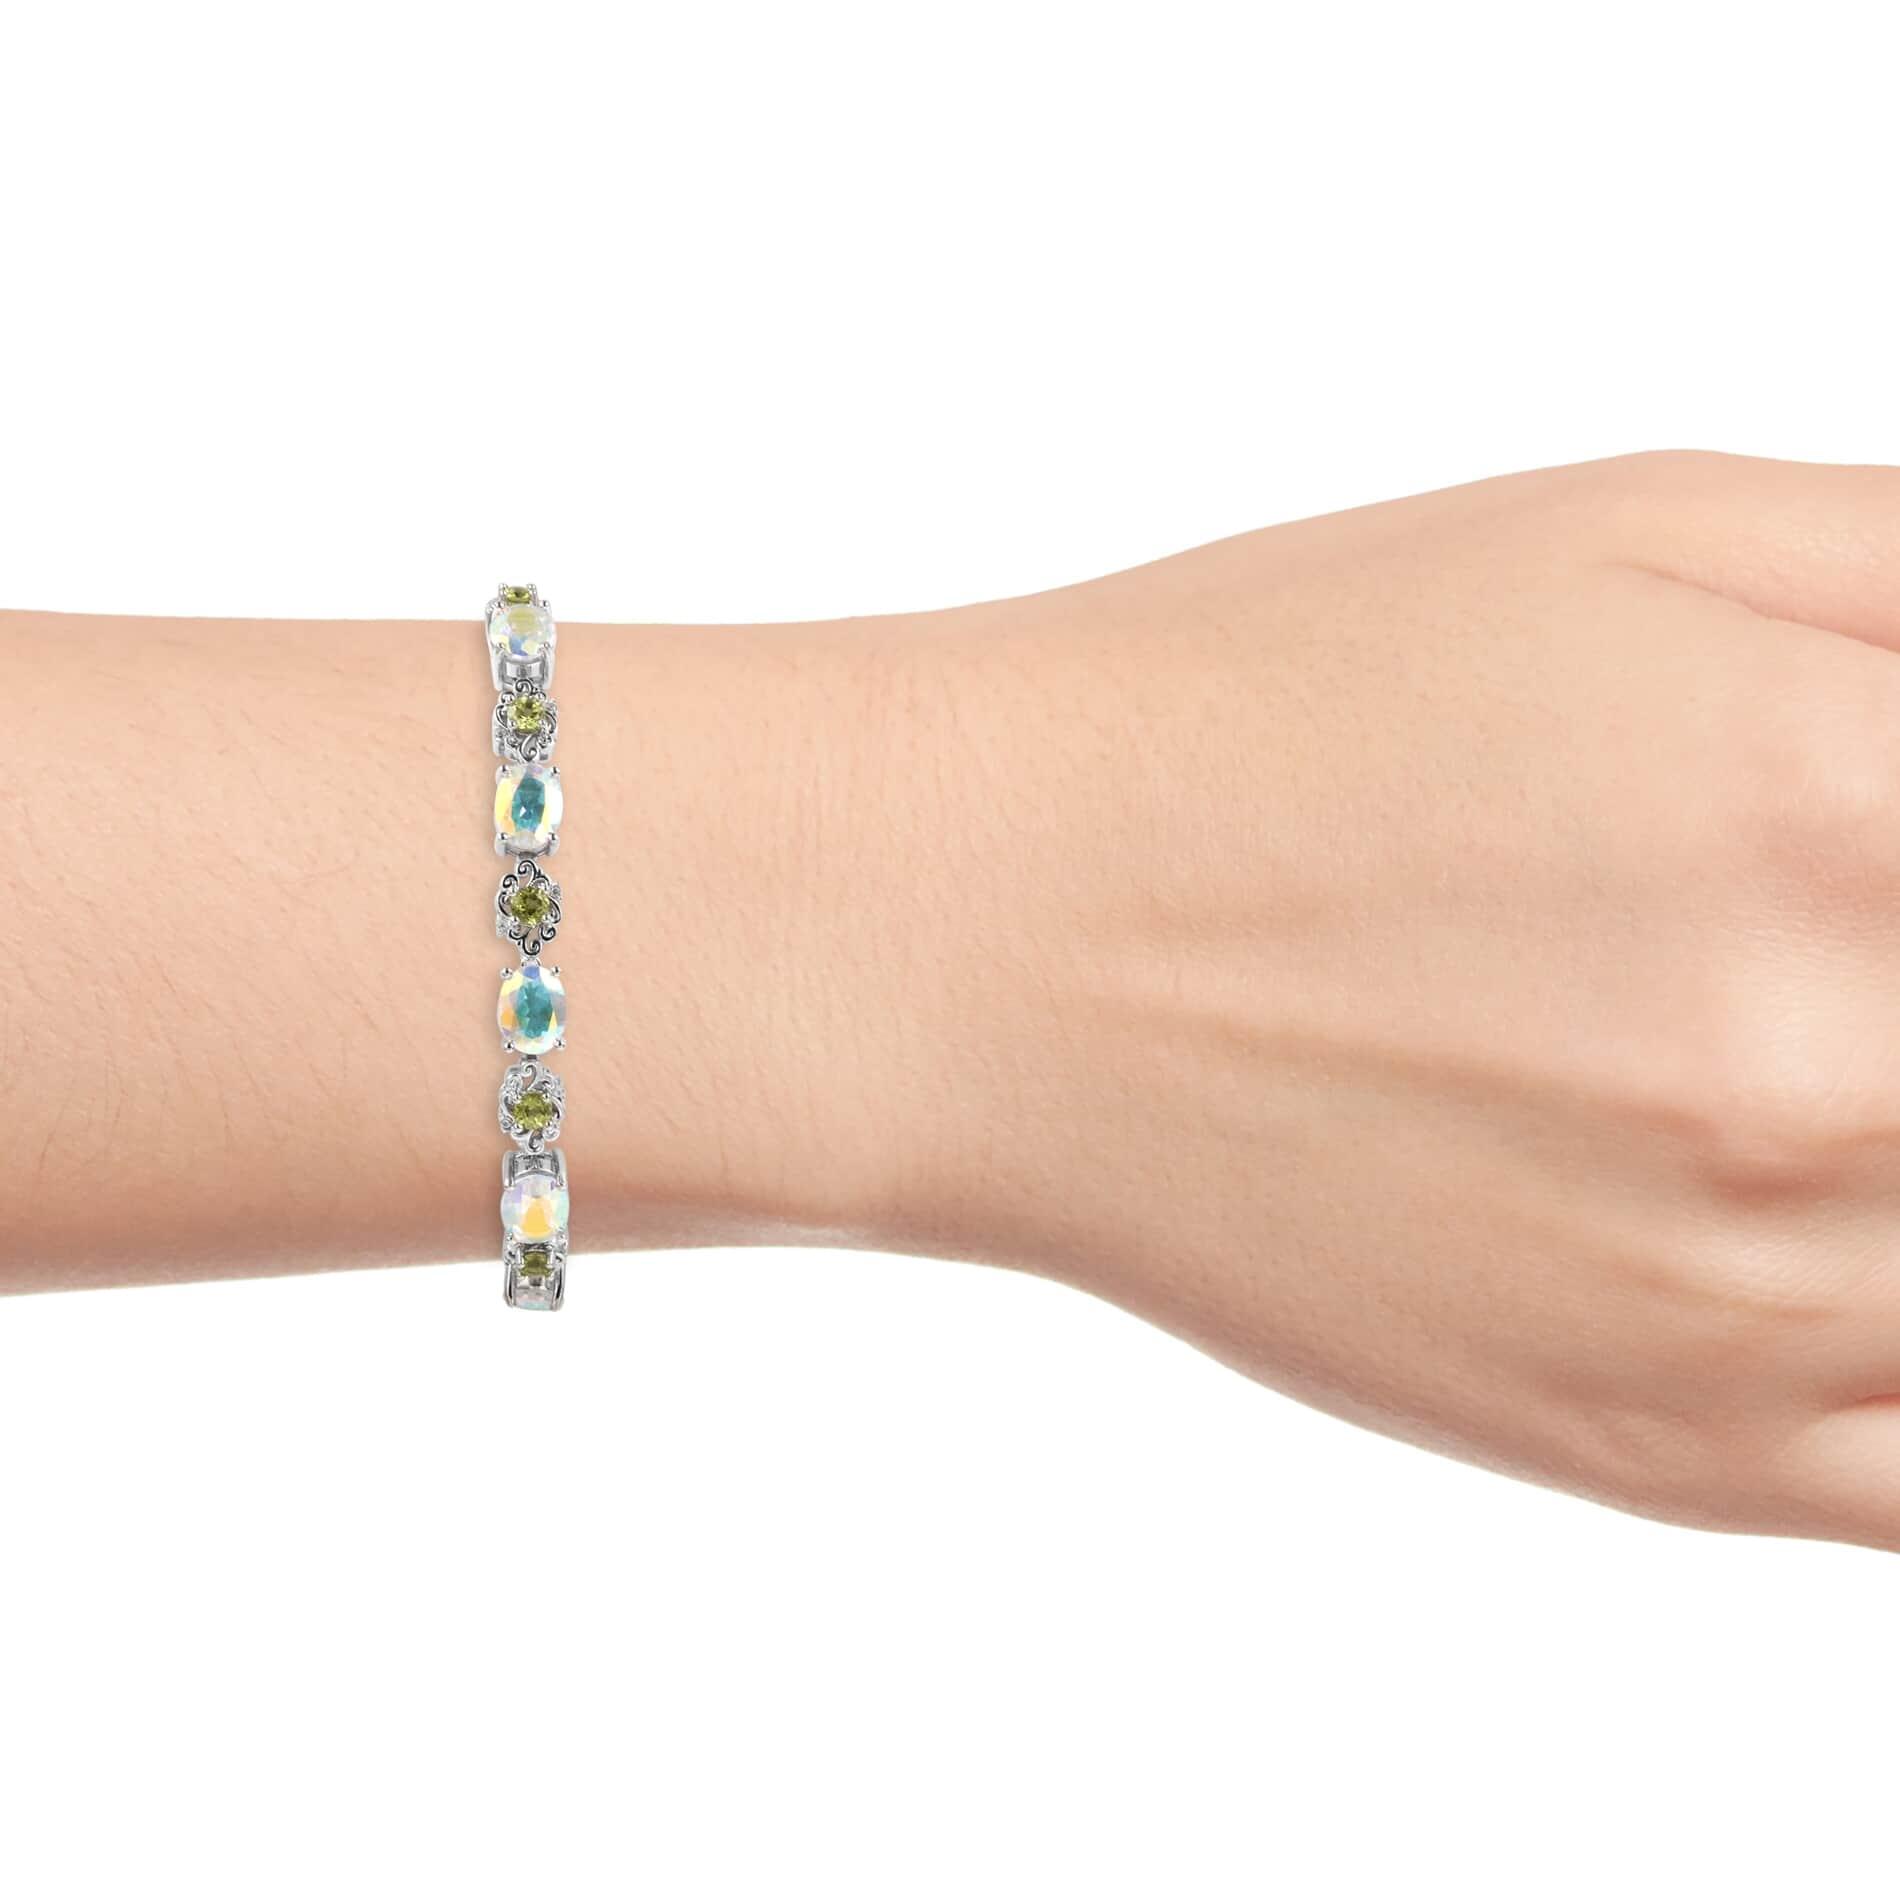 Mercury Mystic Topaz, Multi Gemstone Floral Bolo Bracelet in Sterling  Silver (Adjustable) 13 45 ctw